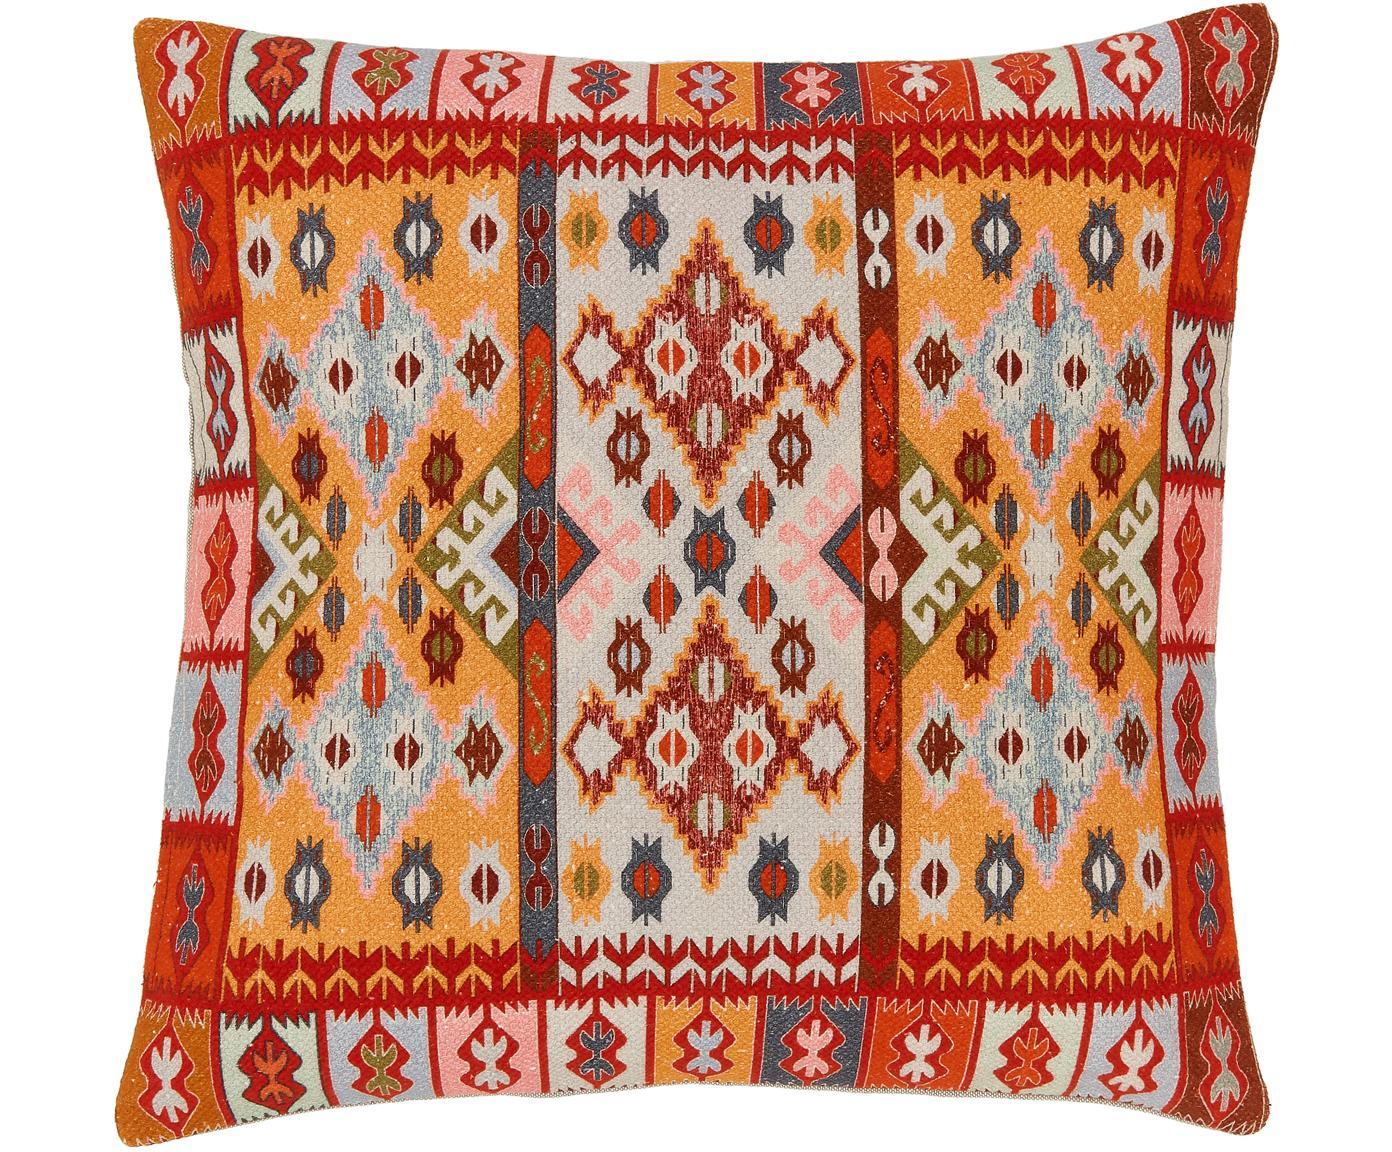 Funda de cojín Budak, estilo étnico, Algodón, Multicolor, An 45 x L 45 cm